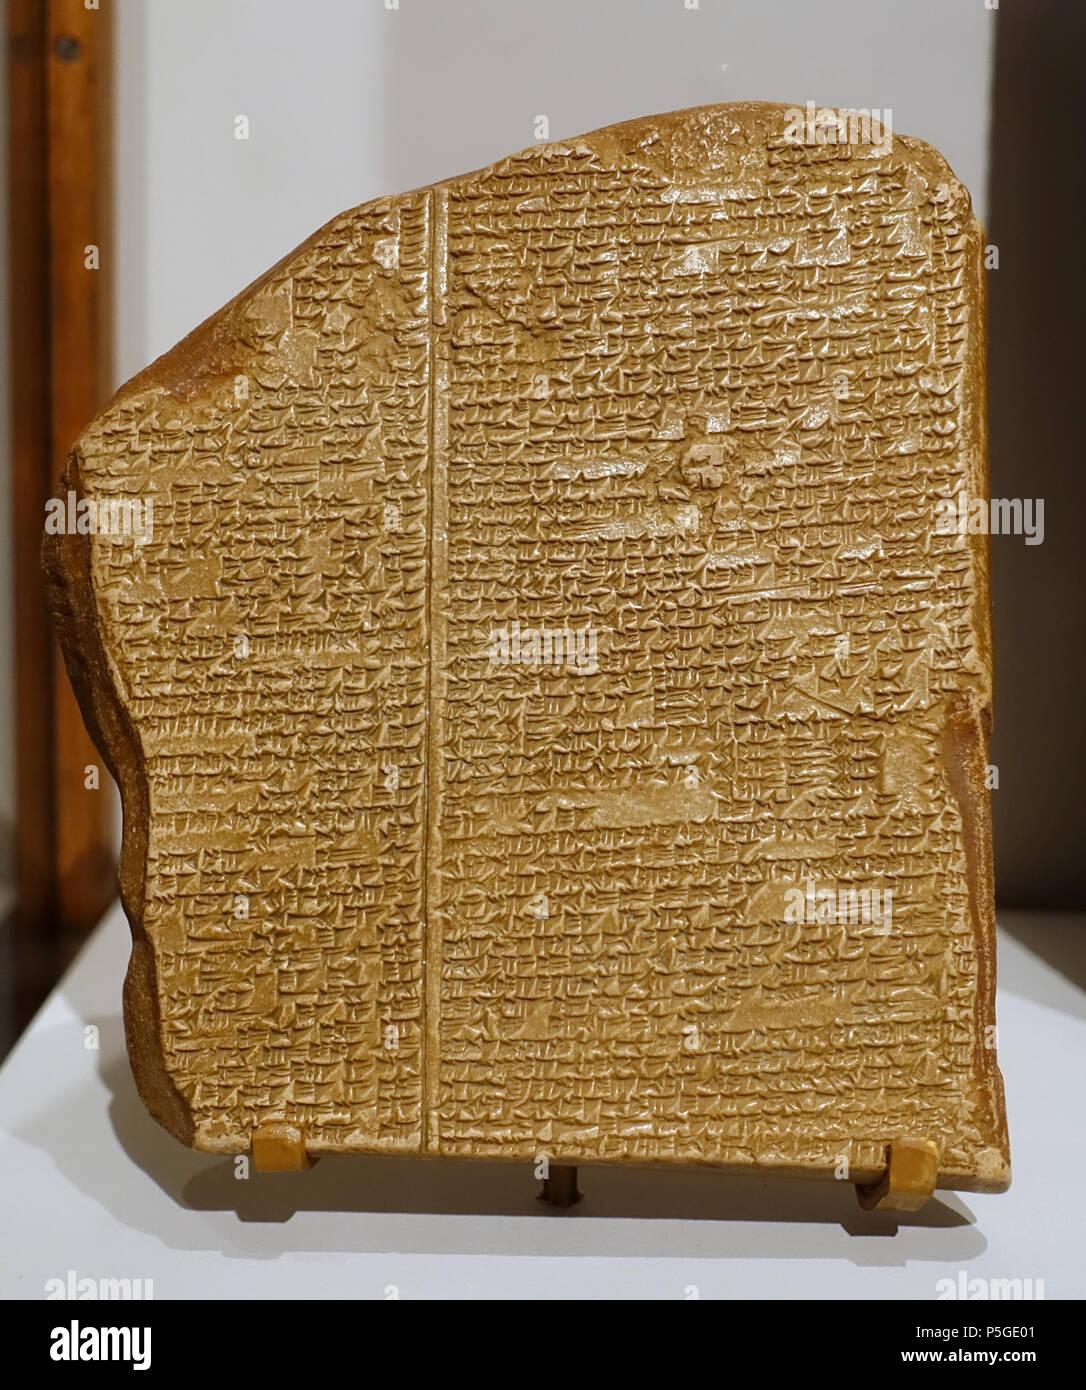 Epic Of Gilgamesh Stock Photos & Epic Of Gilgamesh Stock